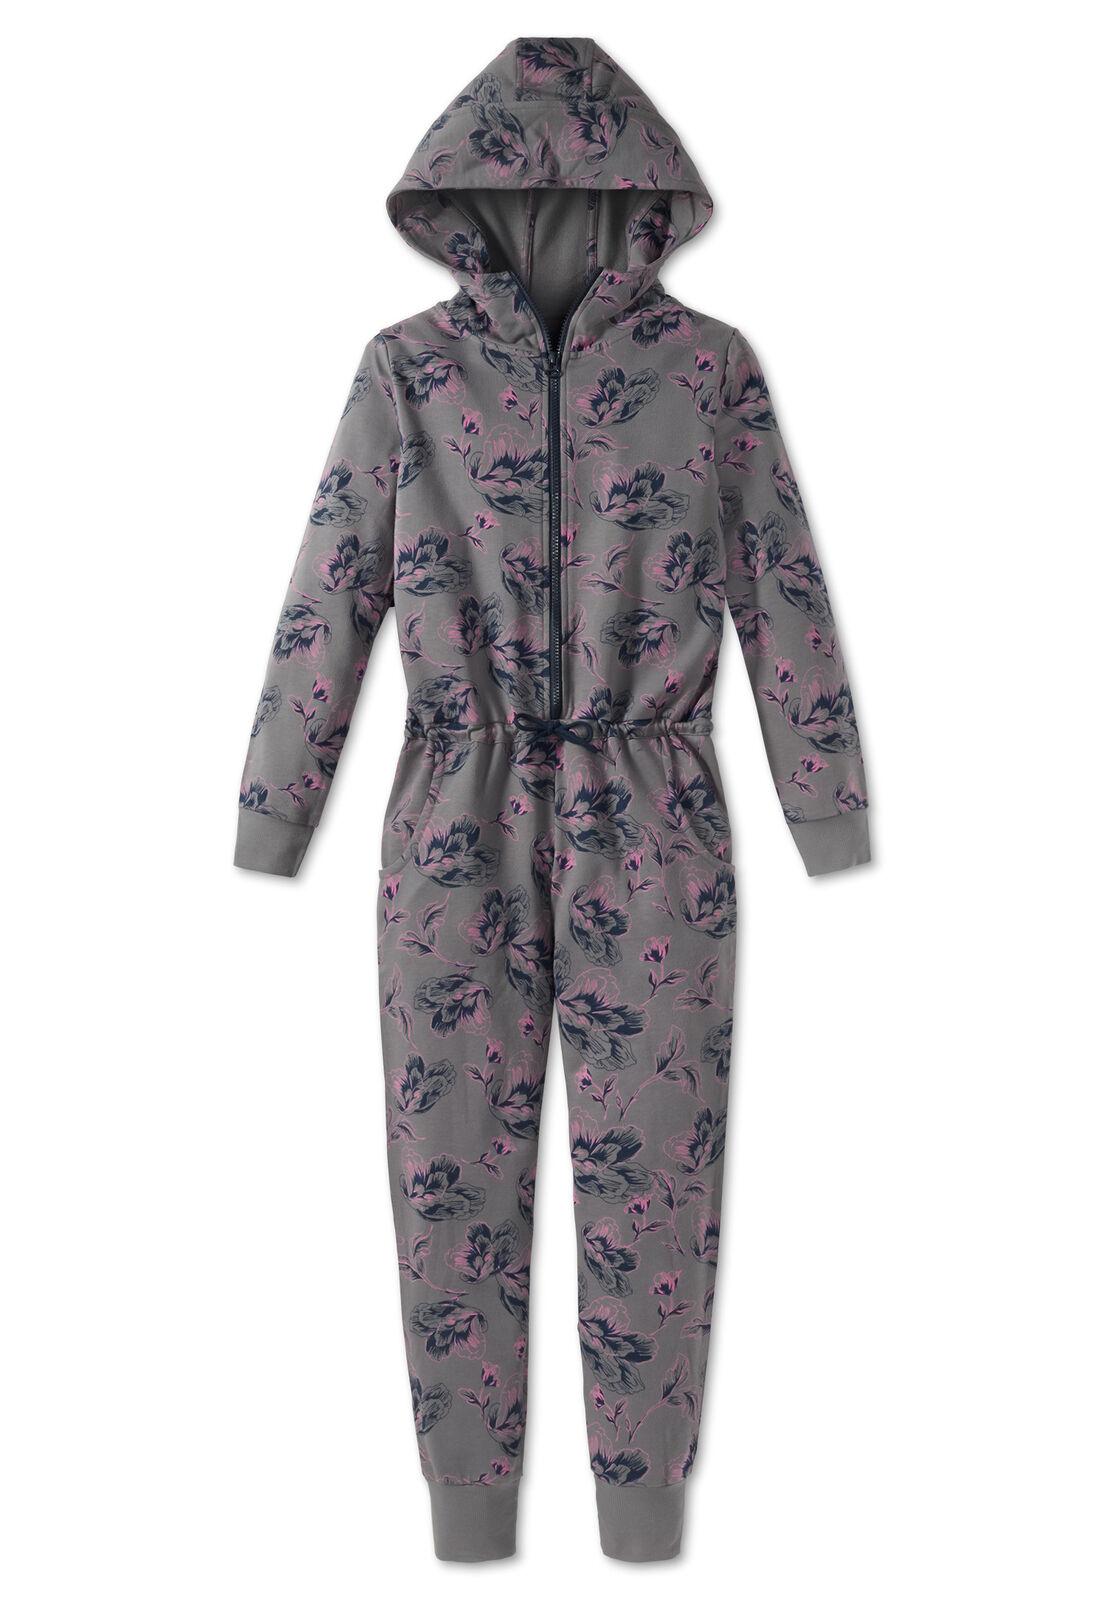 SCHIESSER Mix&Relax Mädchen Schlafanzug Pyjama Jumpsuit Overall NEU*UVP 59,95